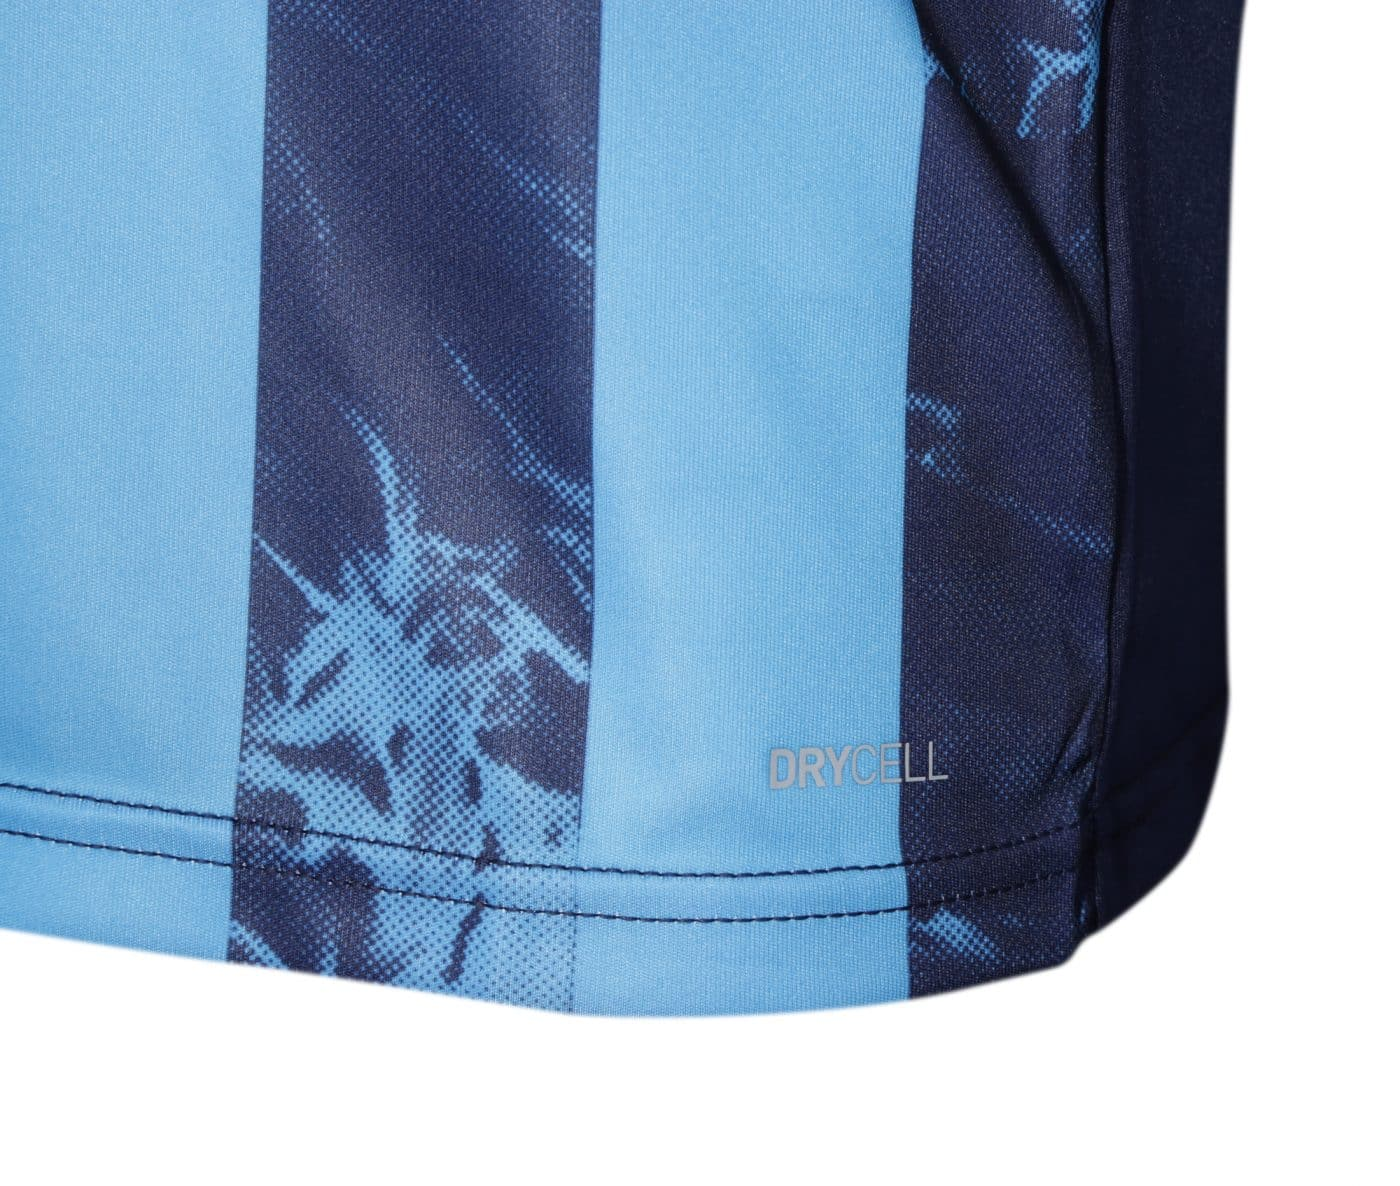 puma-influence-jersey-olympique-de-marseille-16